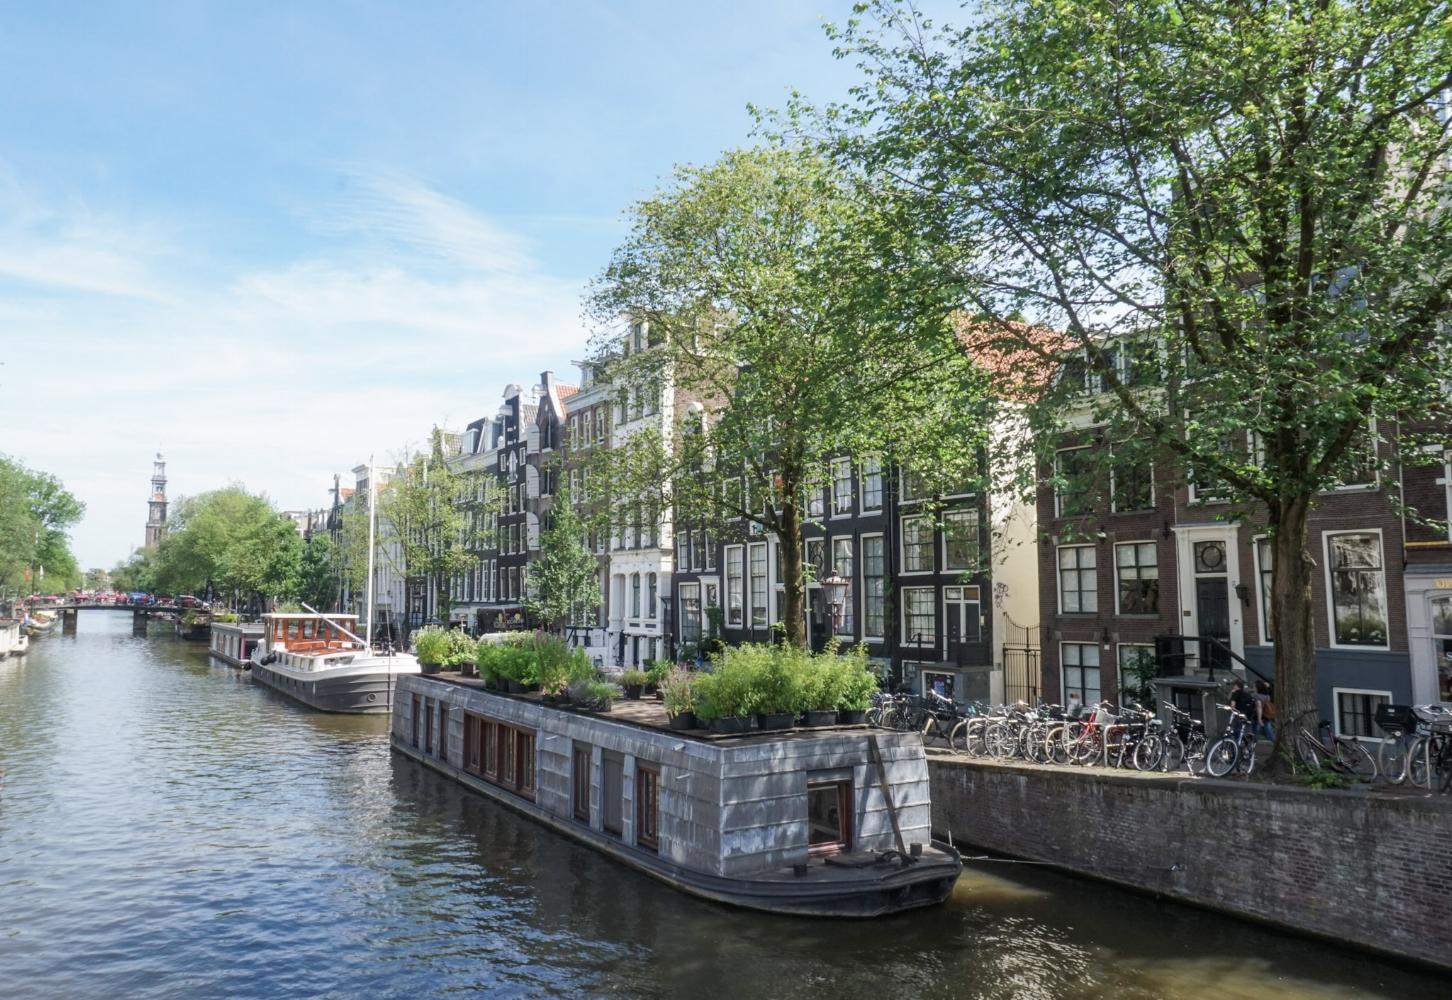 curio.trips.amsterdam.canal.landscape.jpg